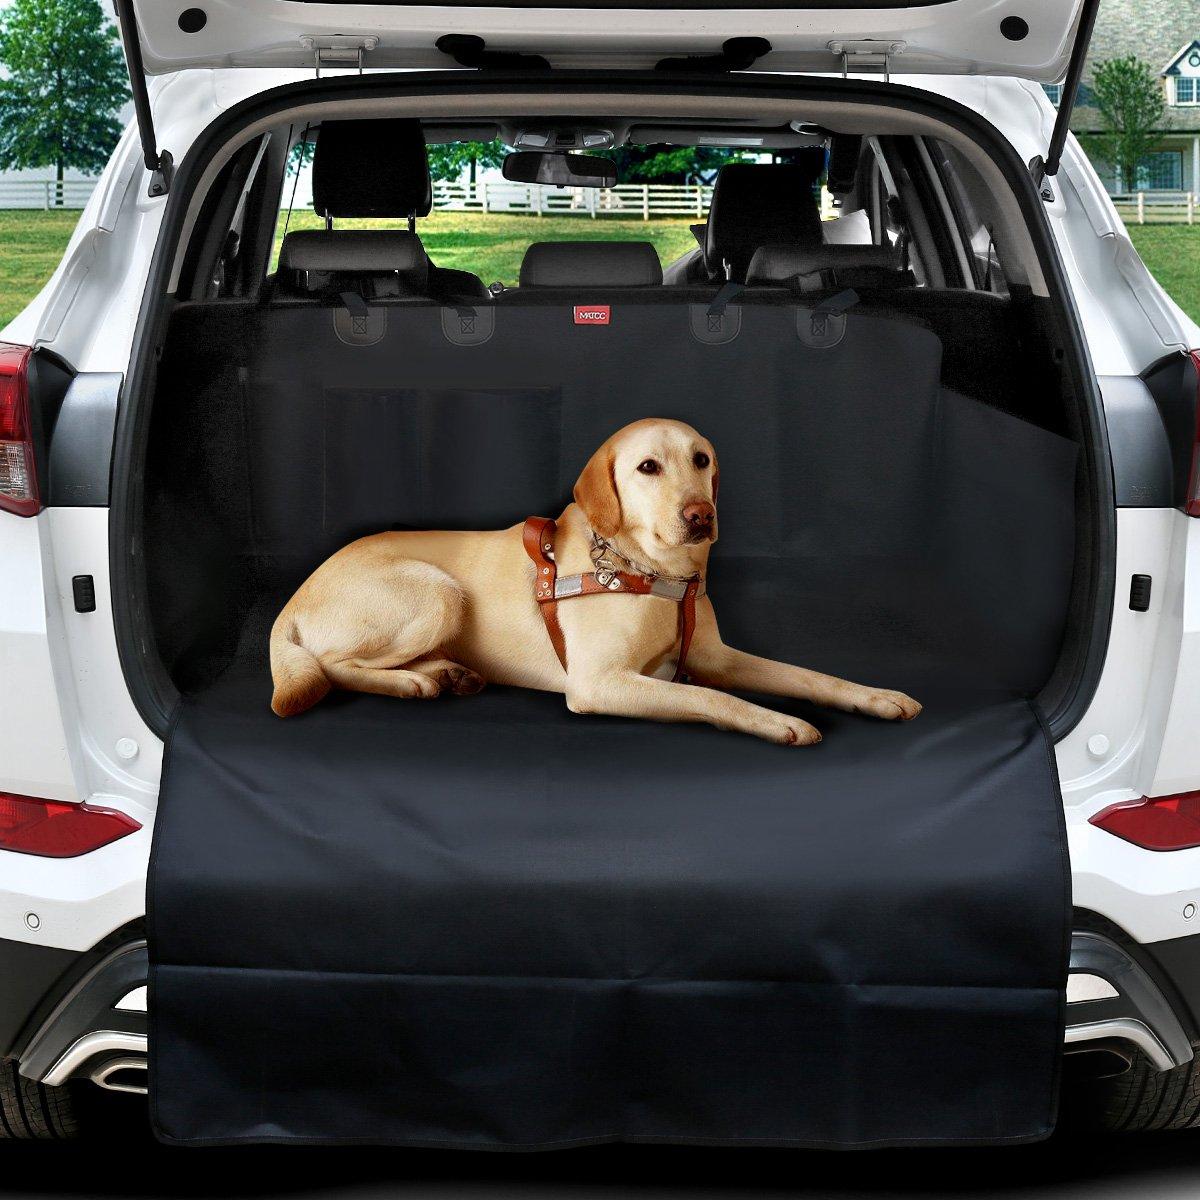 MATCC Boot Liner Heavy Duty Universal Waterproof Car Back Seat Protector Pet Dog Cat Cover Mat Hammock MATCCwoitxol184